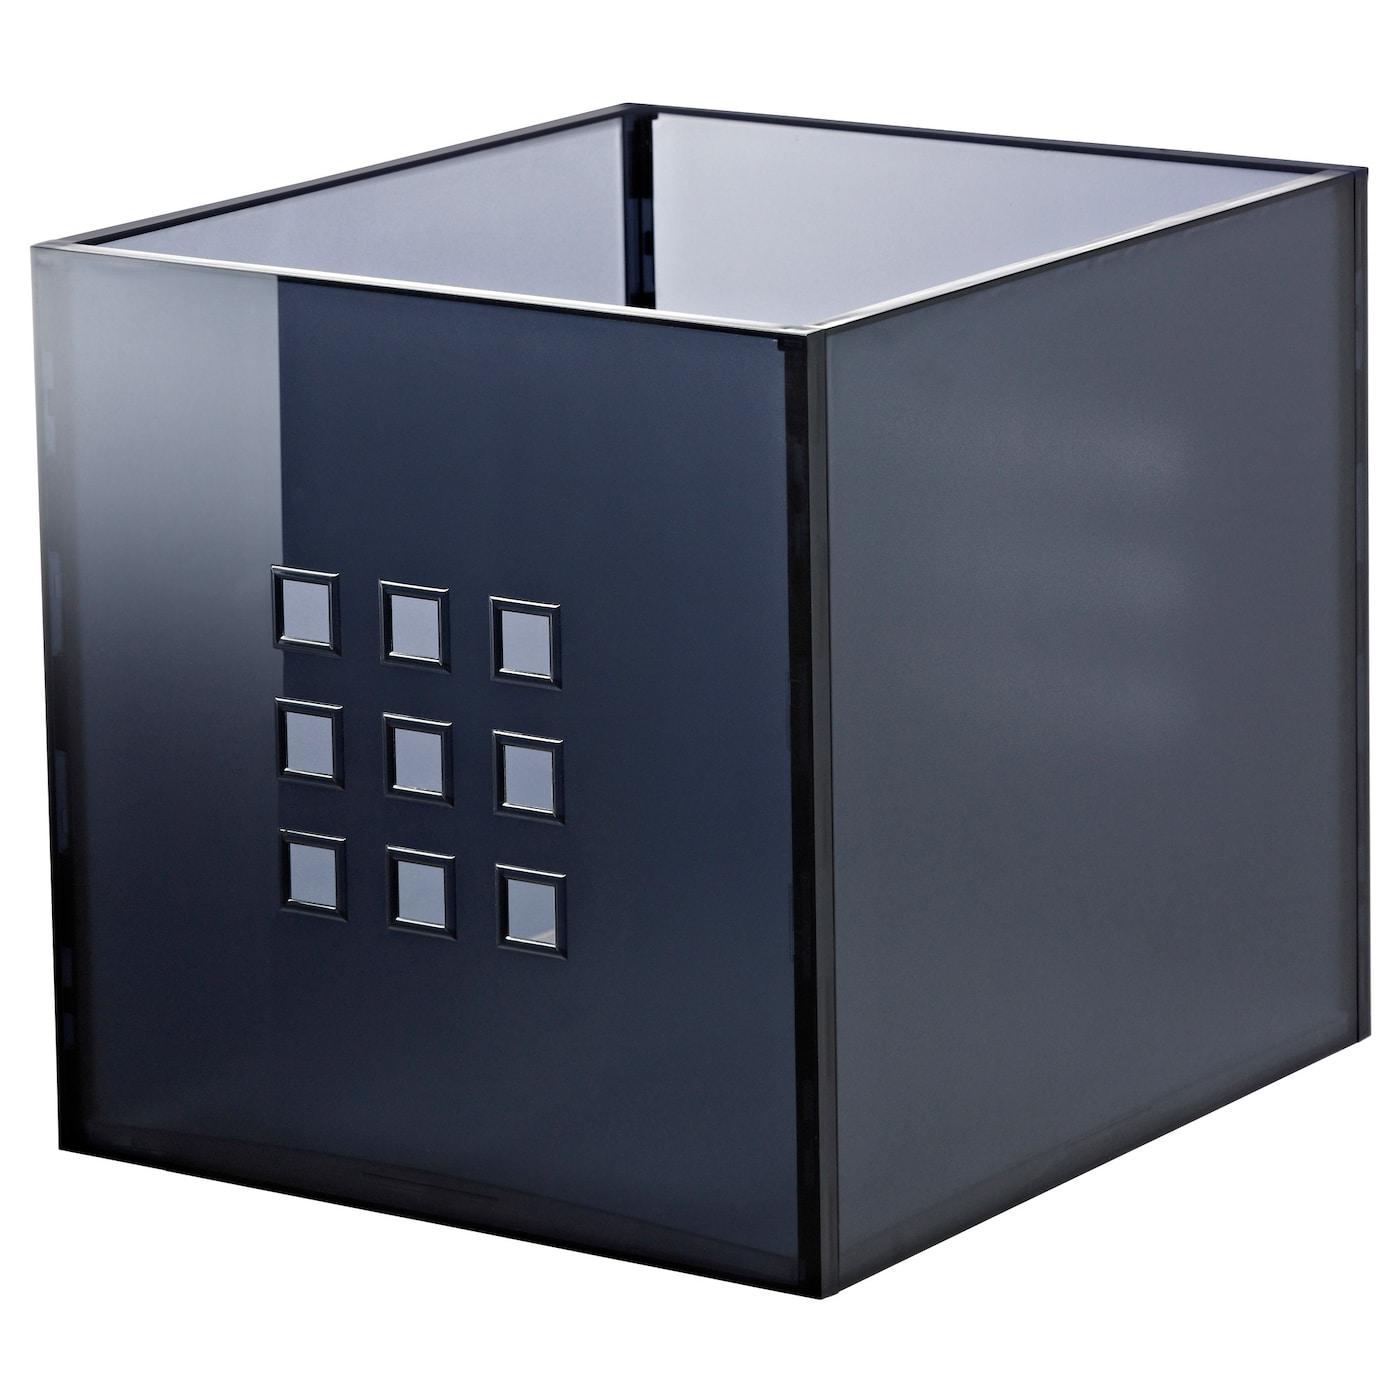 lekman box dark grey 33x37x33 cm ikea. Black Bedroom Furniture Sets. Home Design Ideas